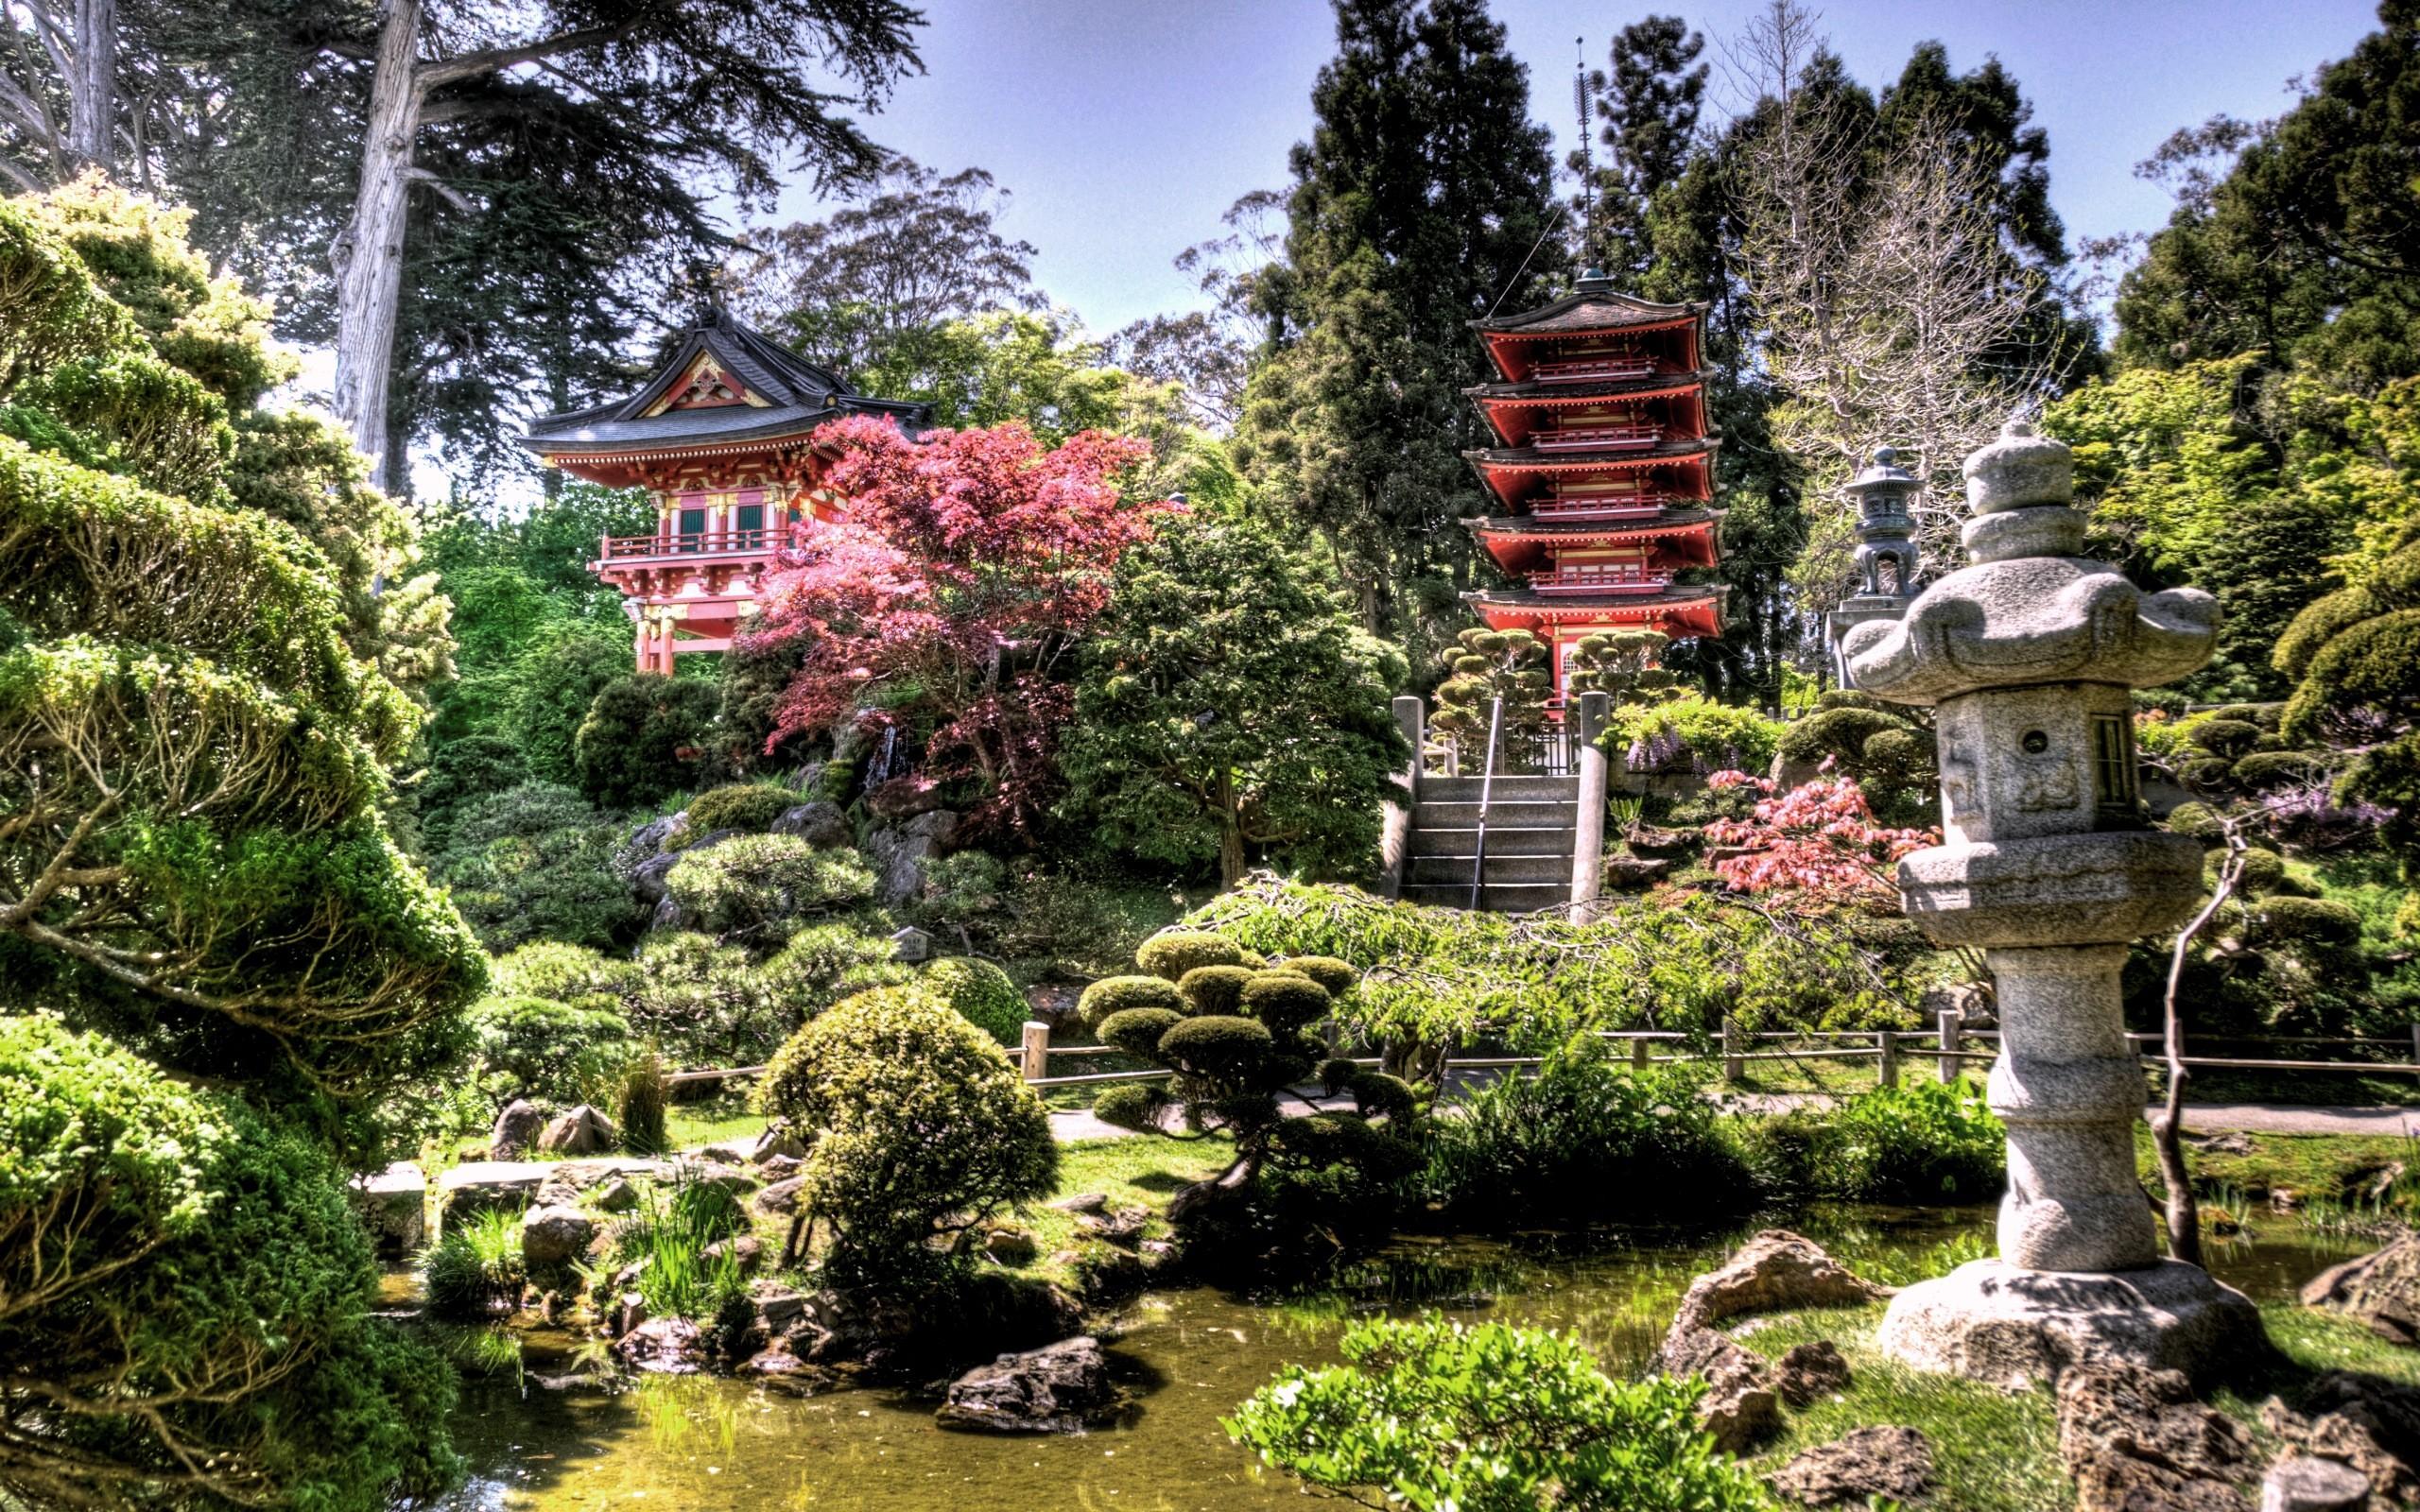 Res: 2560x1600, Japanese Tea Garden desktop wallpaper